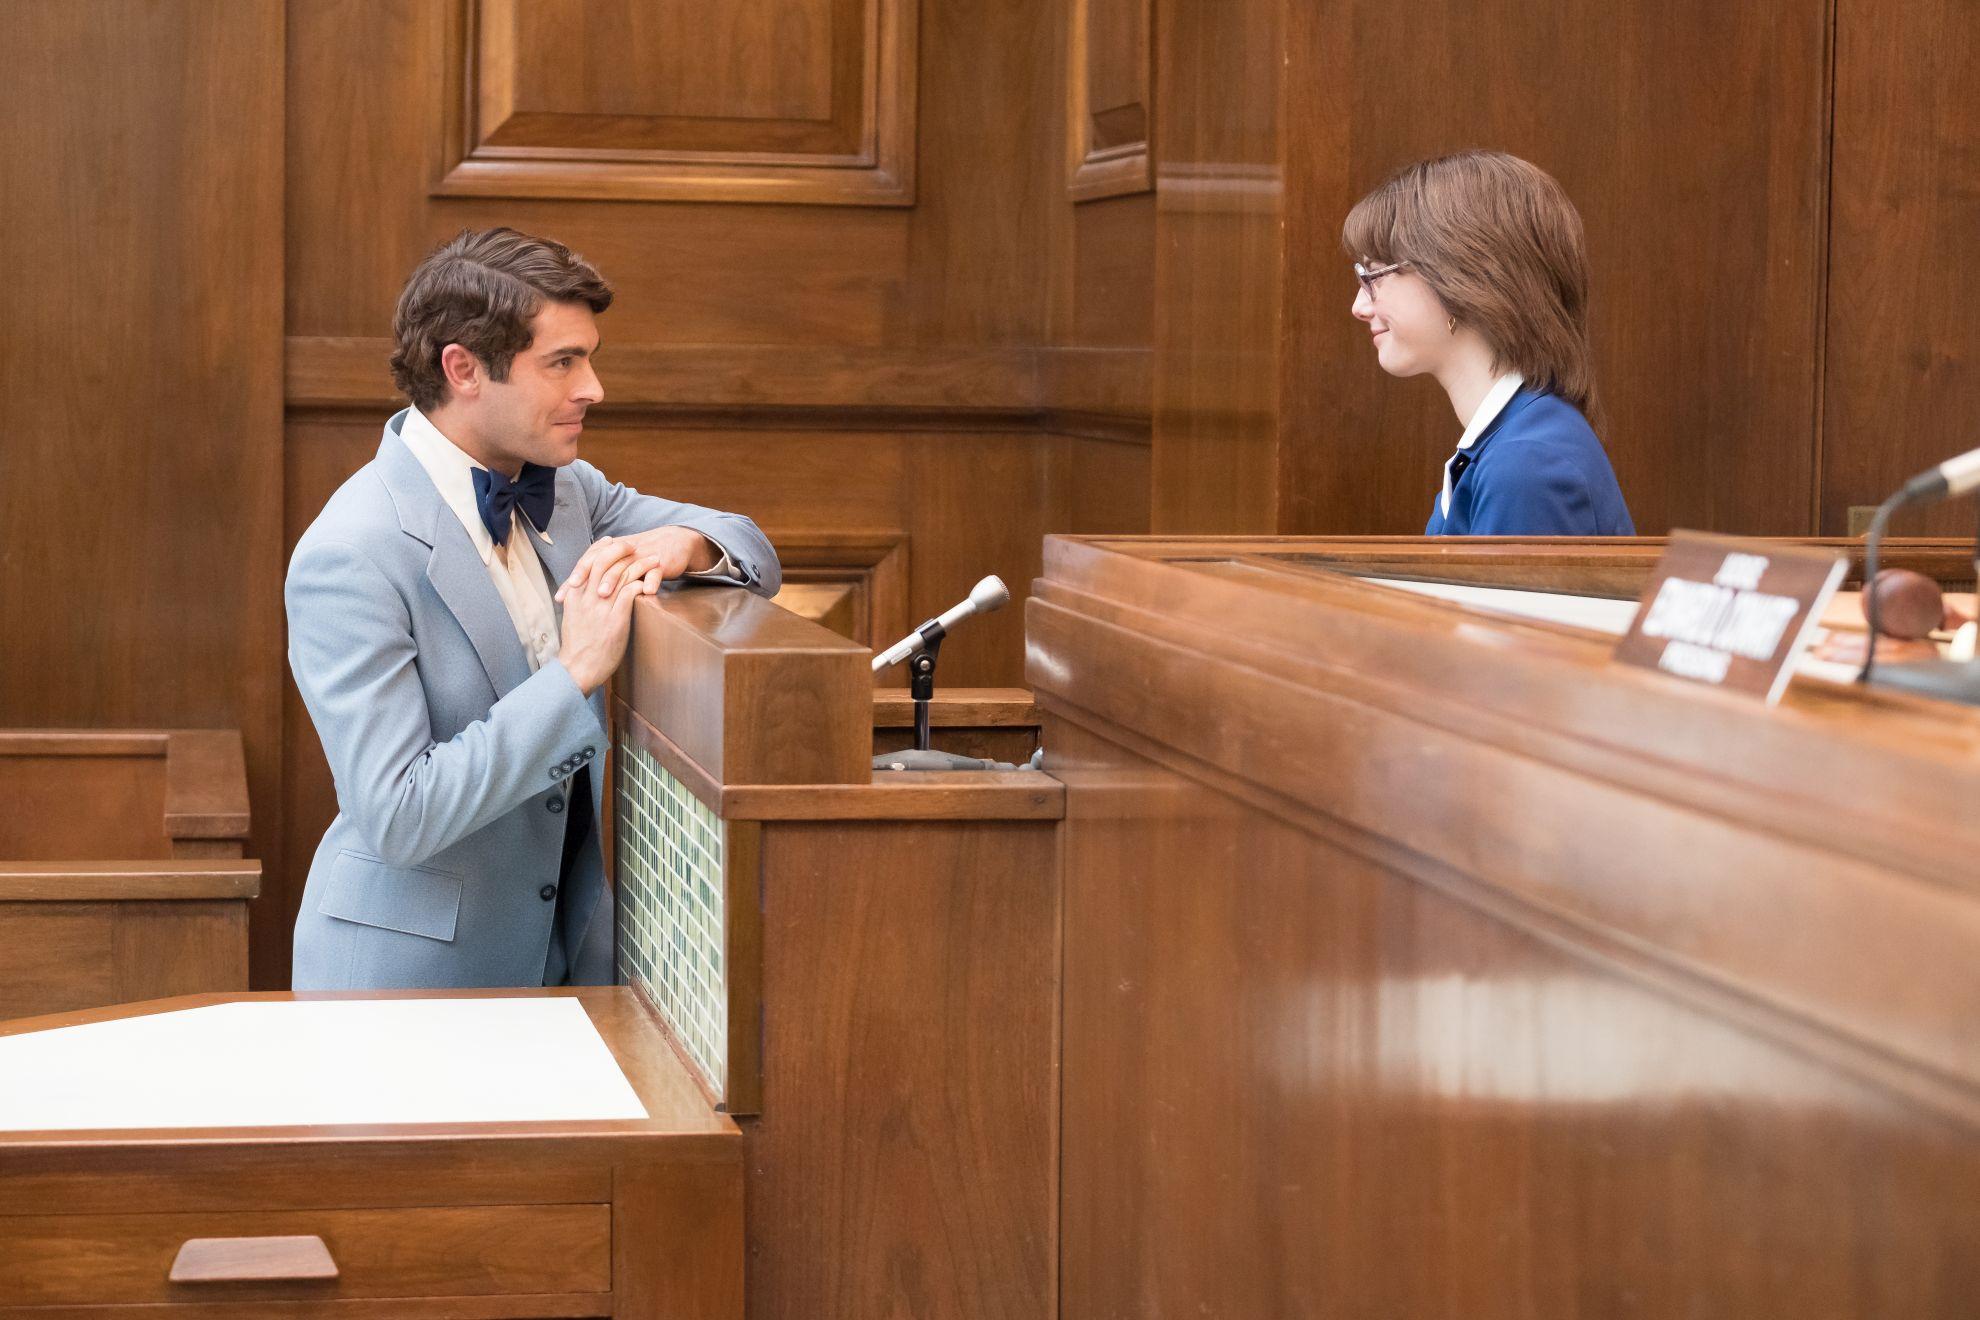 Ted Bundy - Fascino Criminale: Kaya Scodelario e Zac Efron in una scena del film